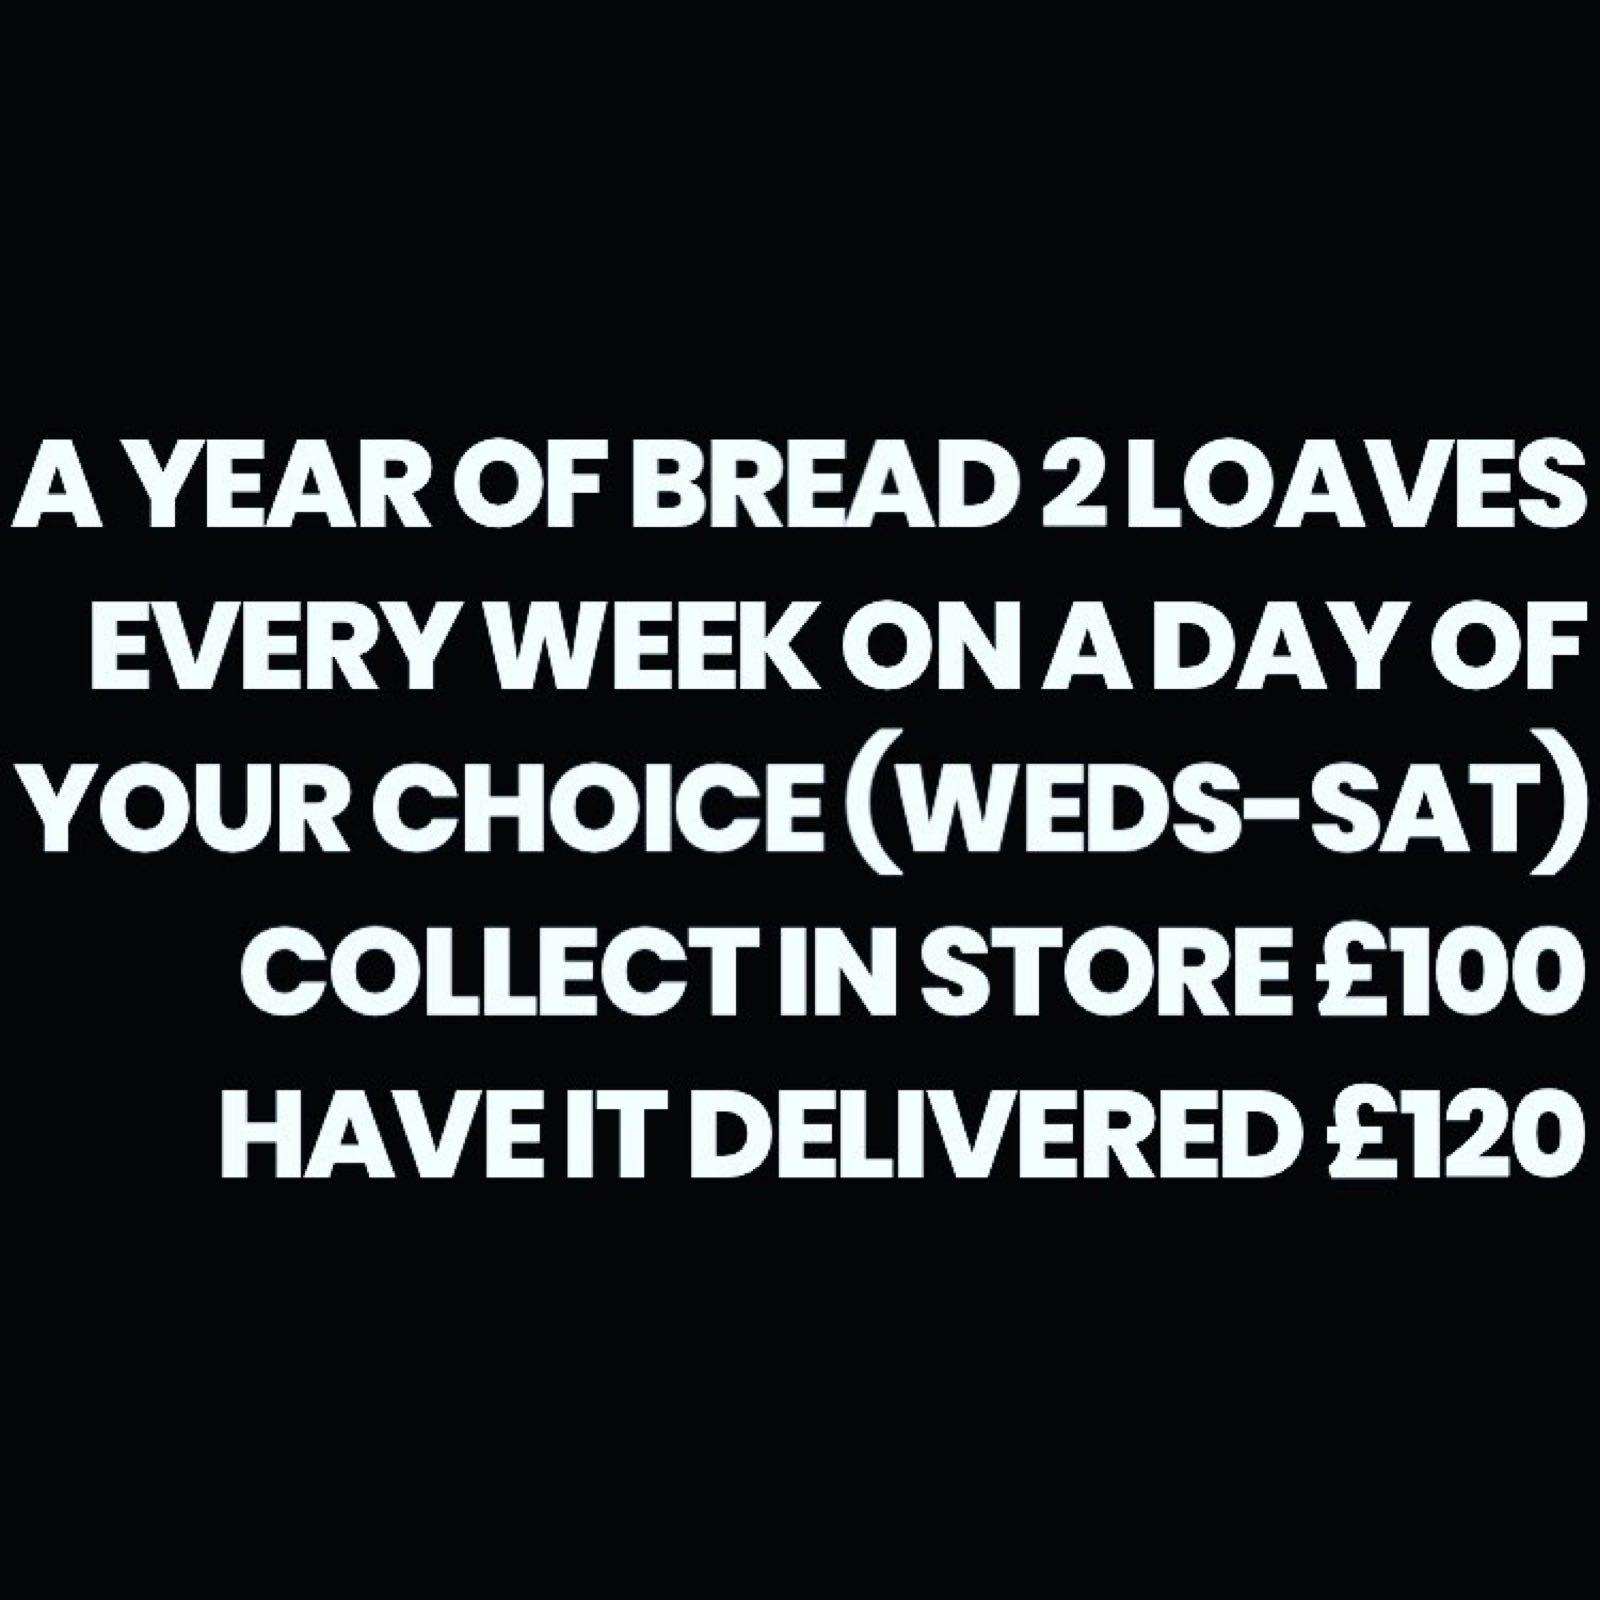 A Year in Bread